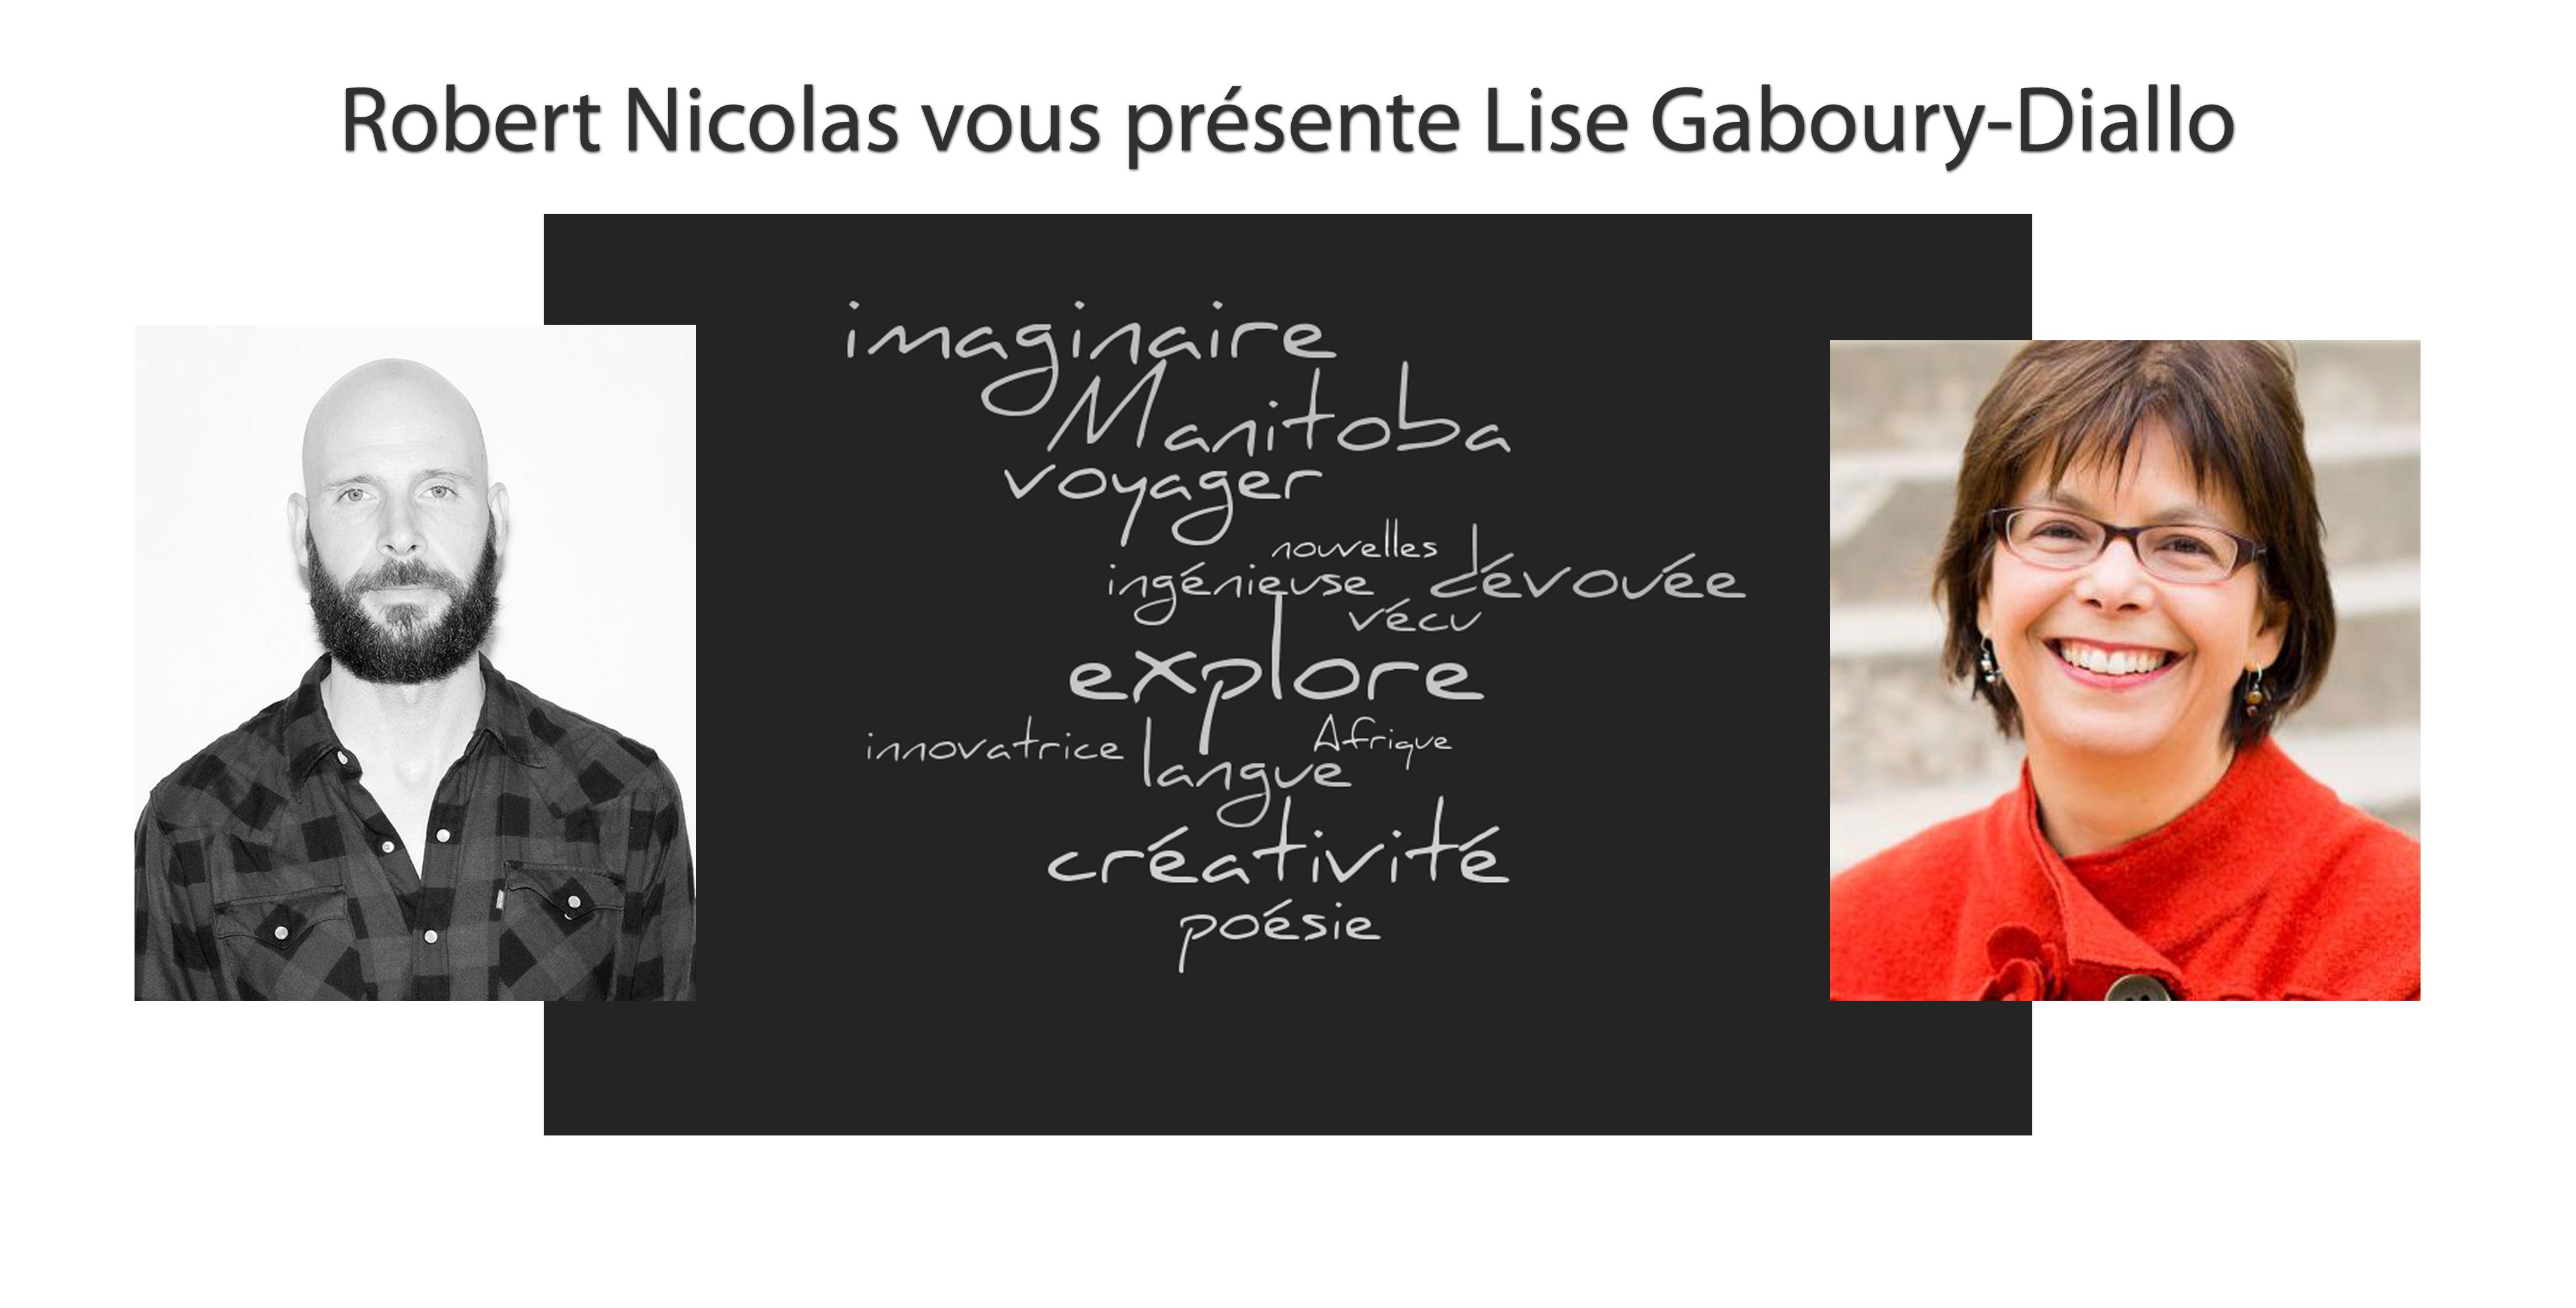 Robert Nicolas vous présente Lise Gaboury-Diallo